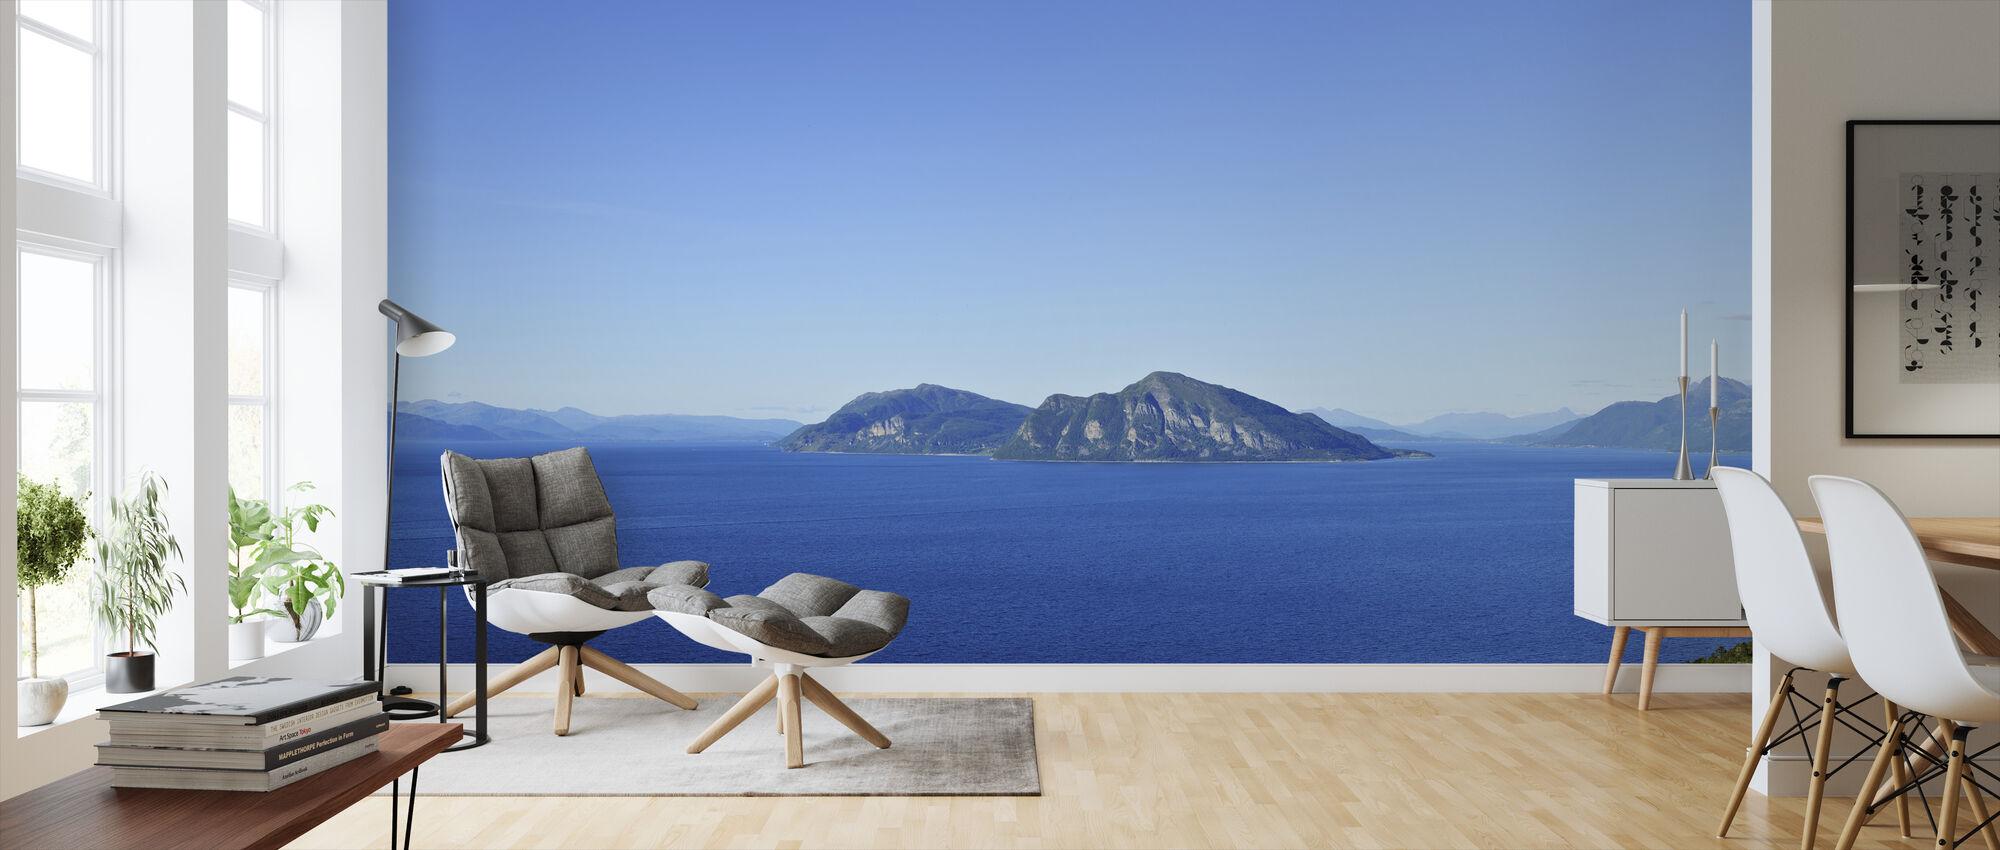 Vågsfjorden Panorama, Norway - Wallpaper - Living Room